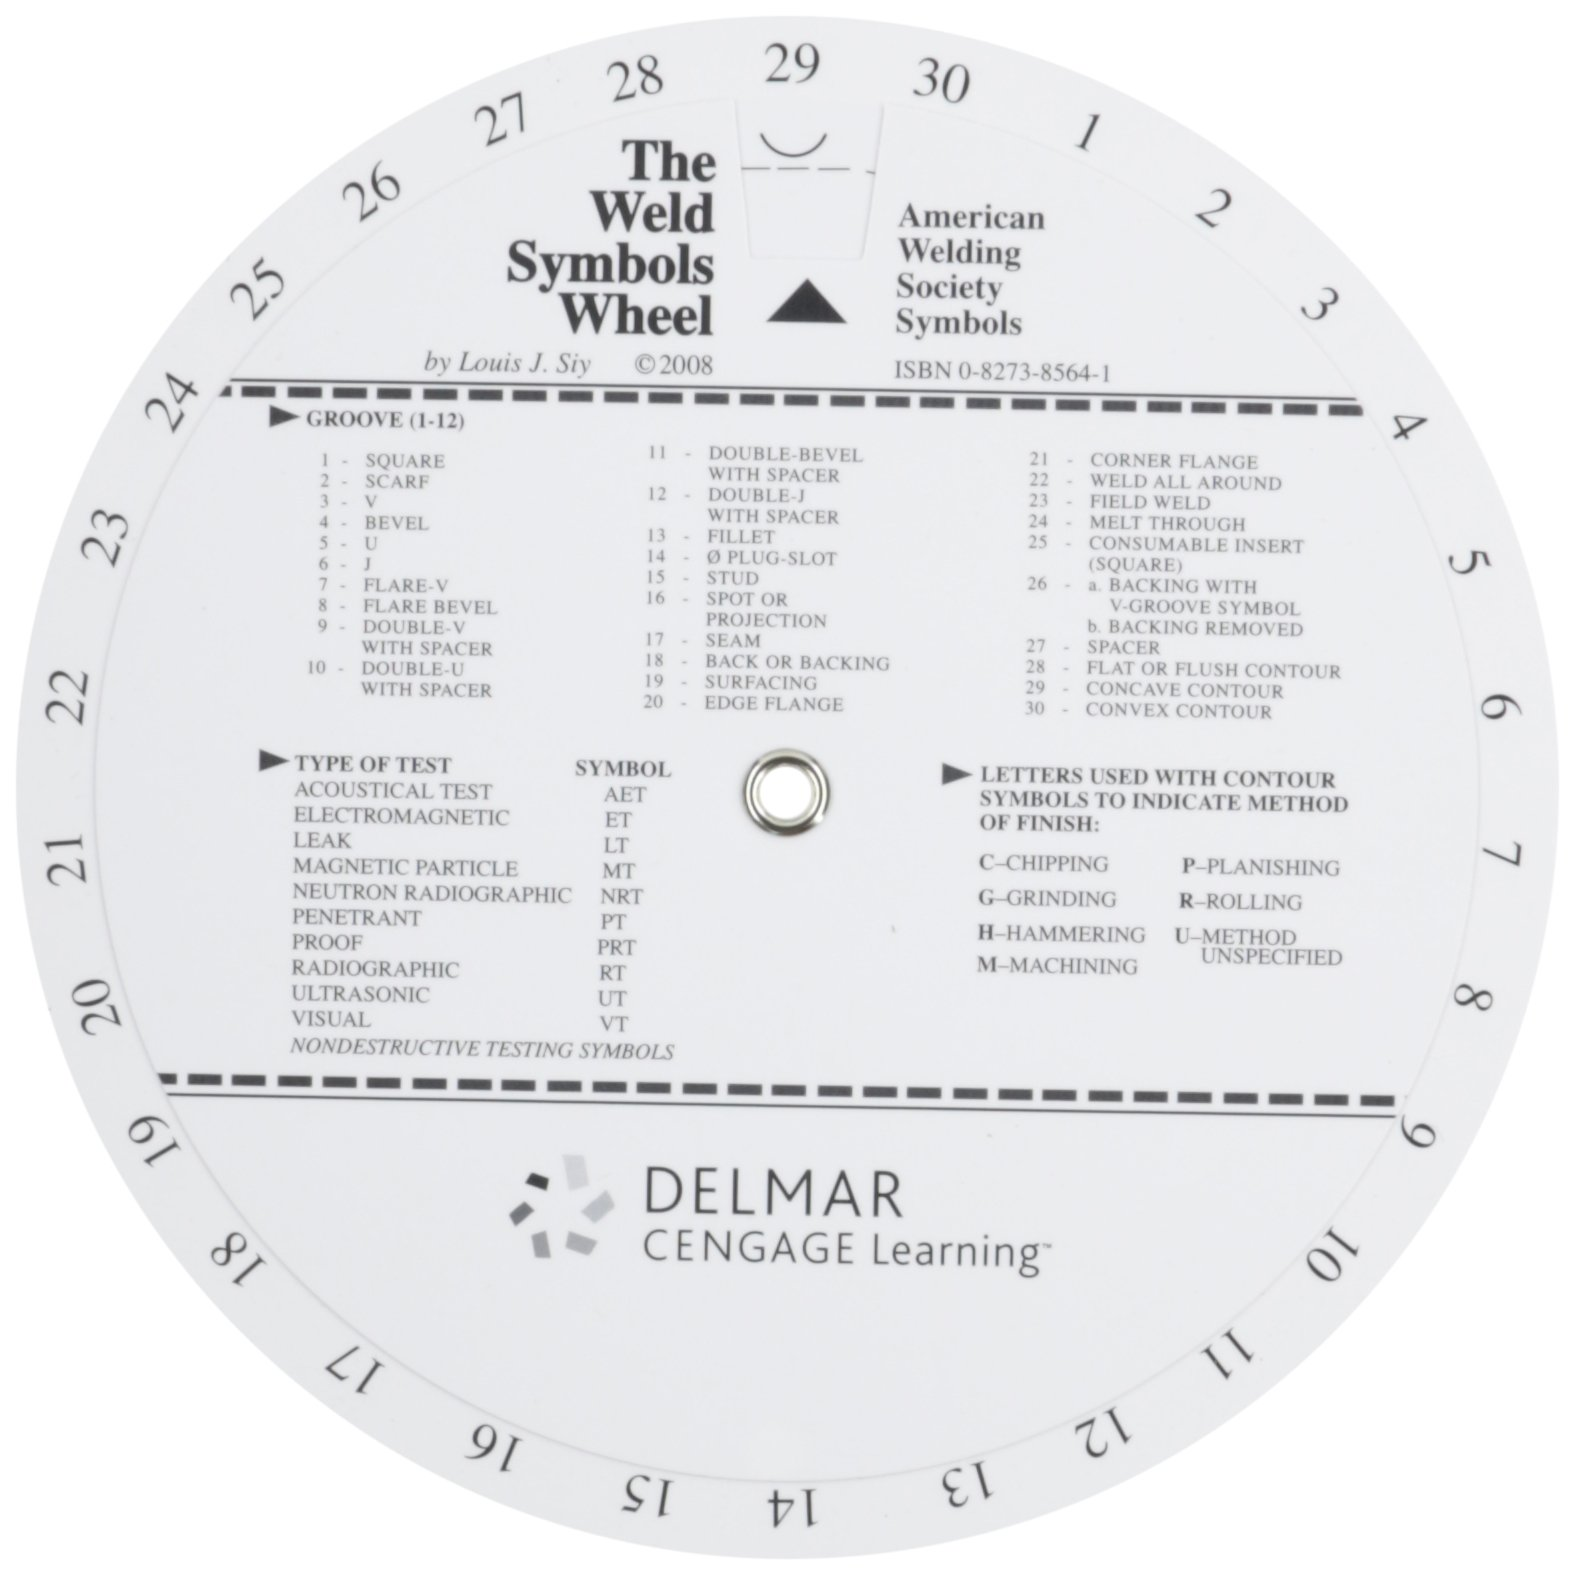 Buy the weld symbols wheel delmars blueprint reading book buy the weld symbols wheel delmars blueprint reading book online at low prices in india the weld symbols wheel delmars blueprint reading reviews biocorpaavc Gallery